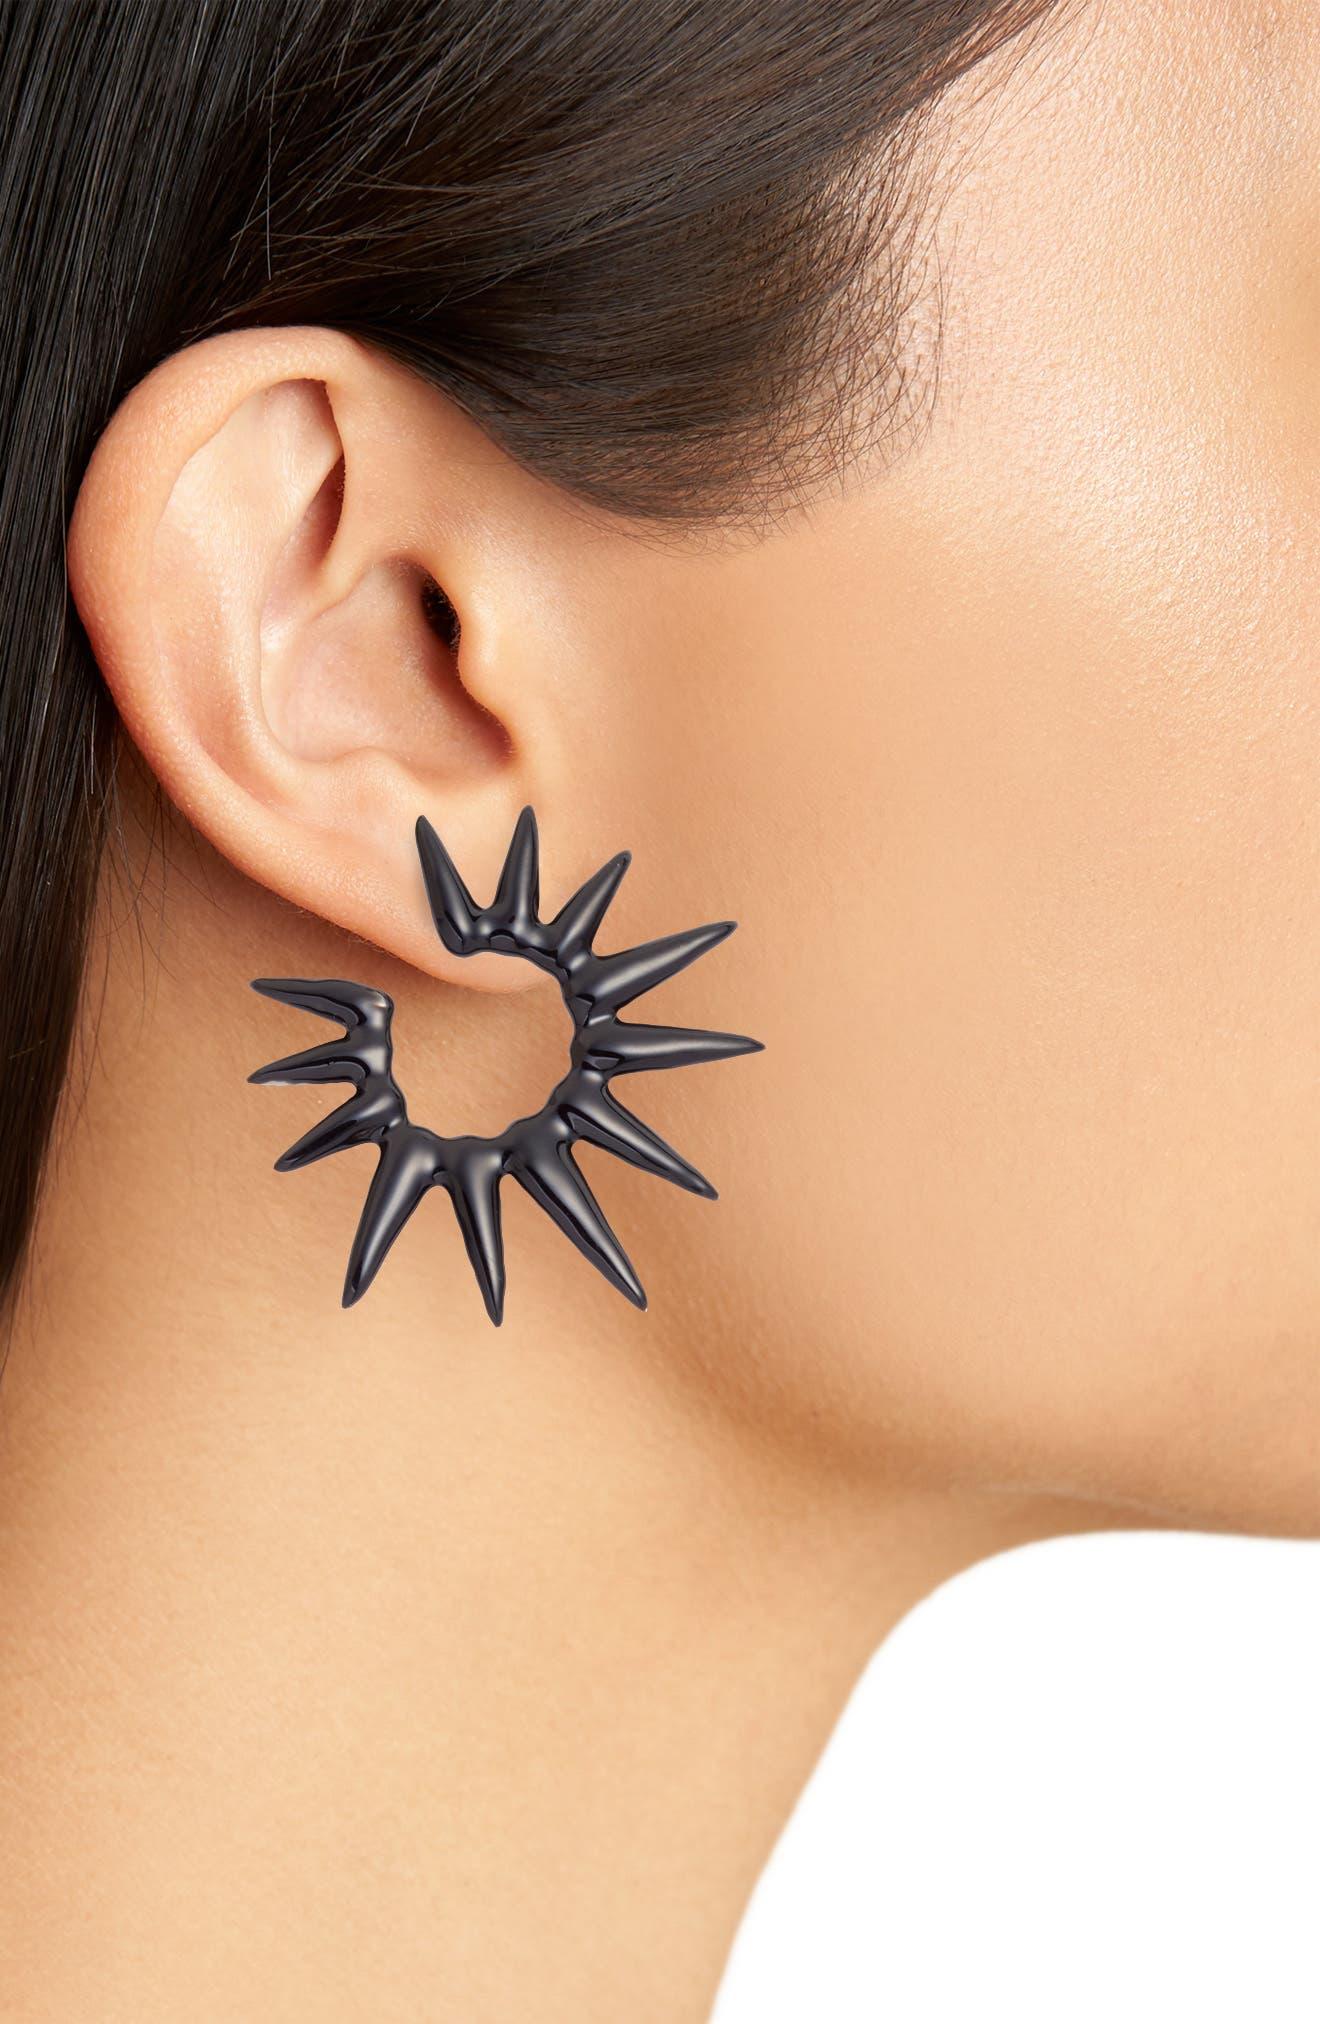 Small Enamel Sea Urchin Earrings,                             Alternate thumbnail 2, color,                             001